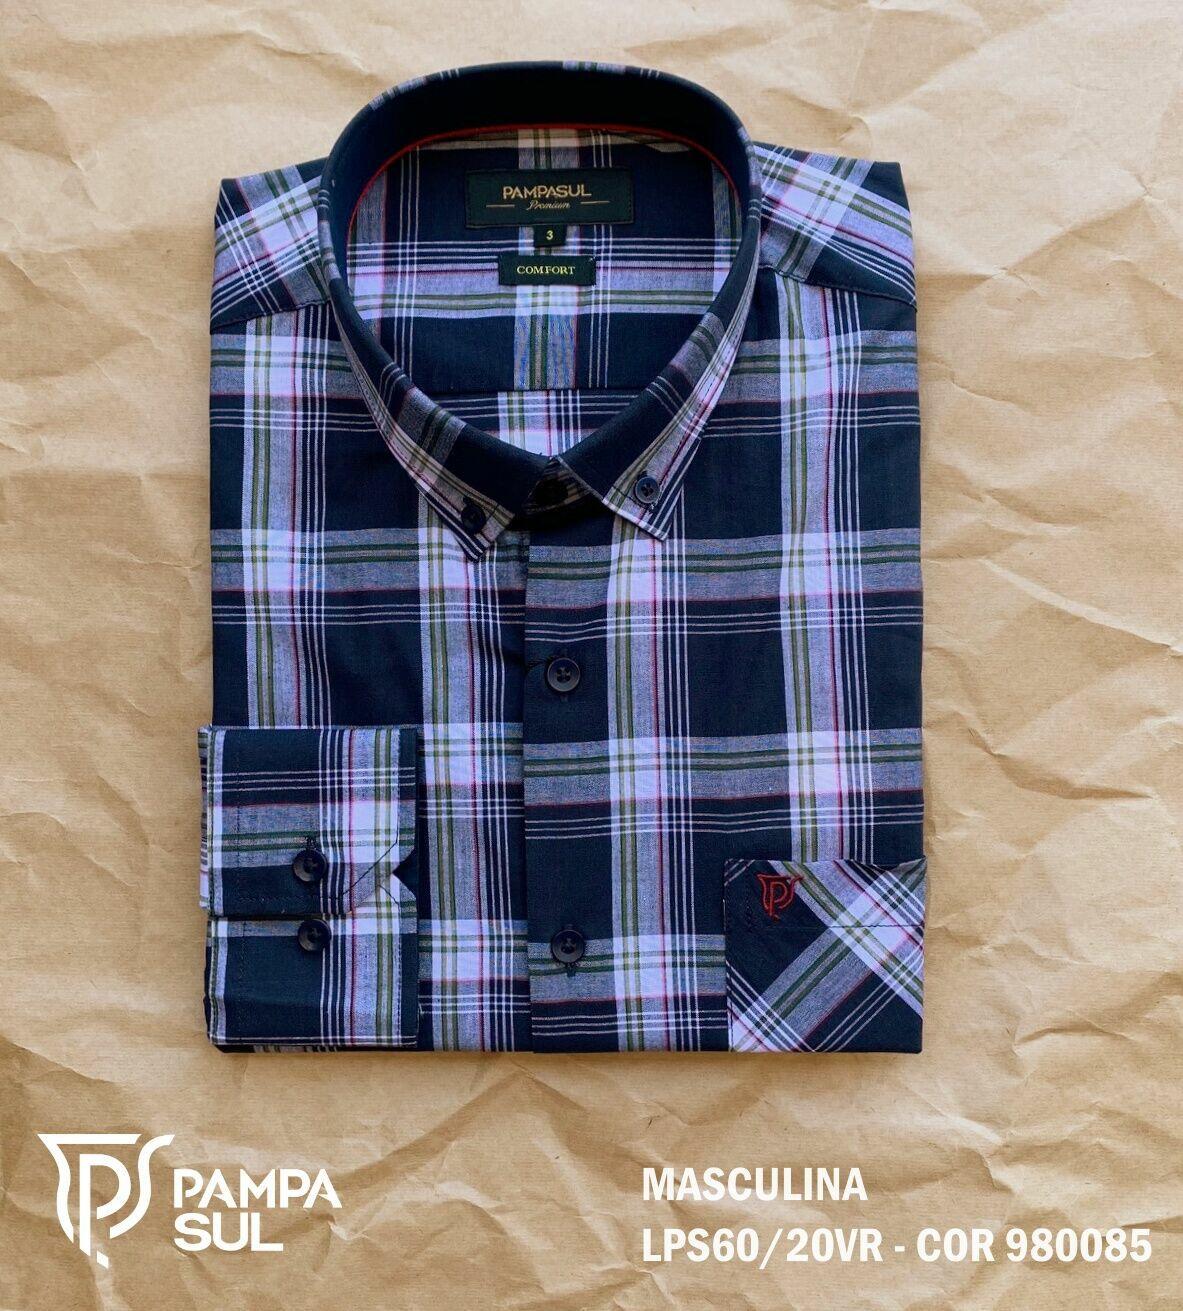 Camisa Pampa Sul Masculina Slim Confort LPS 60/20